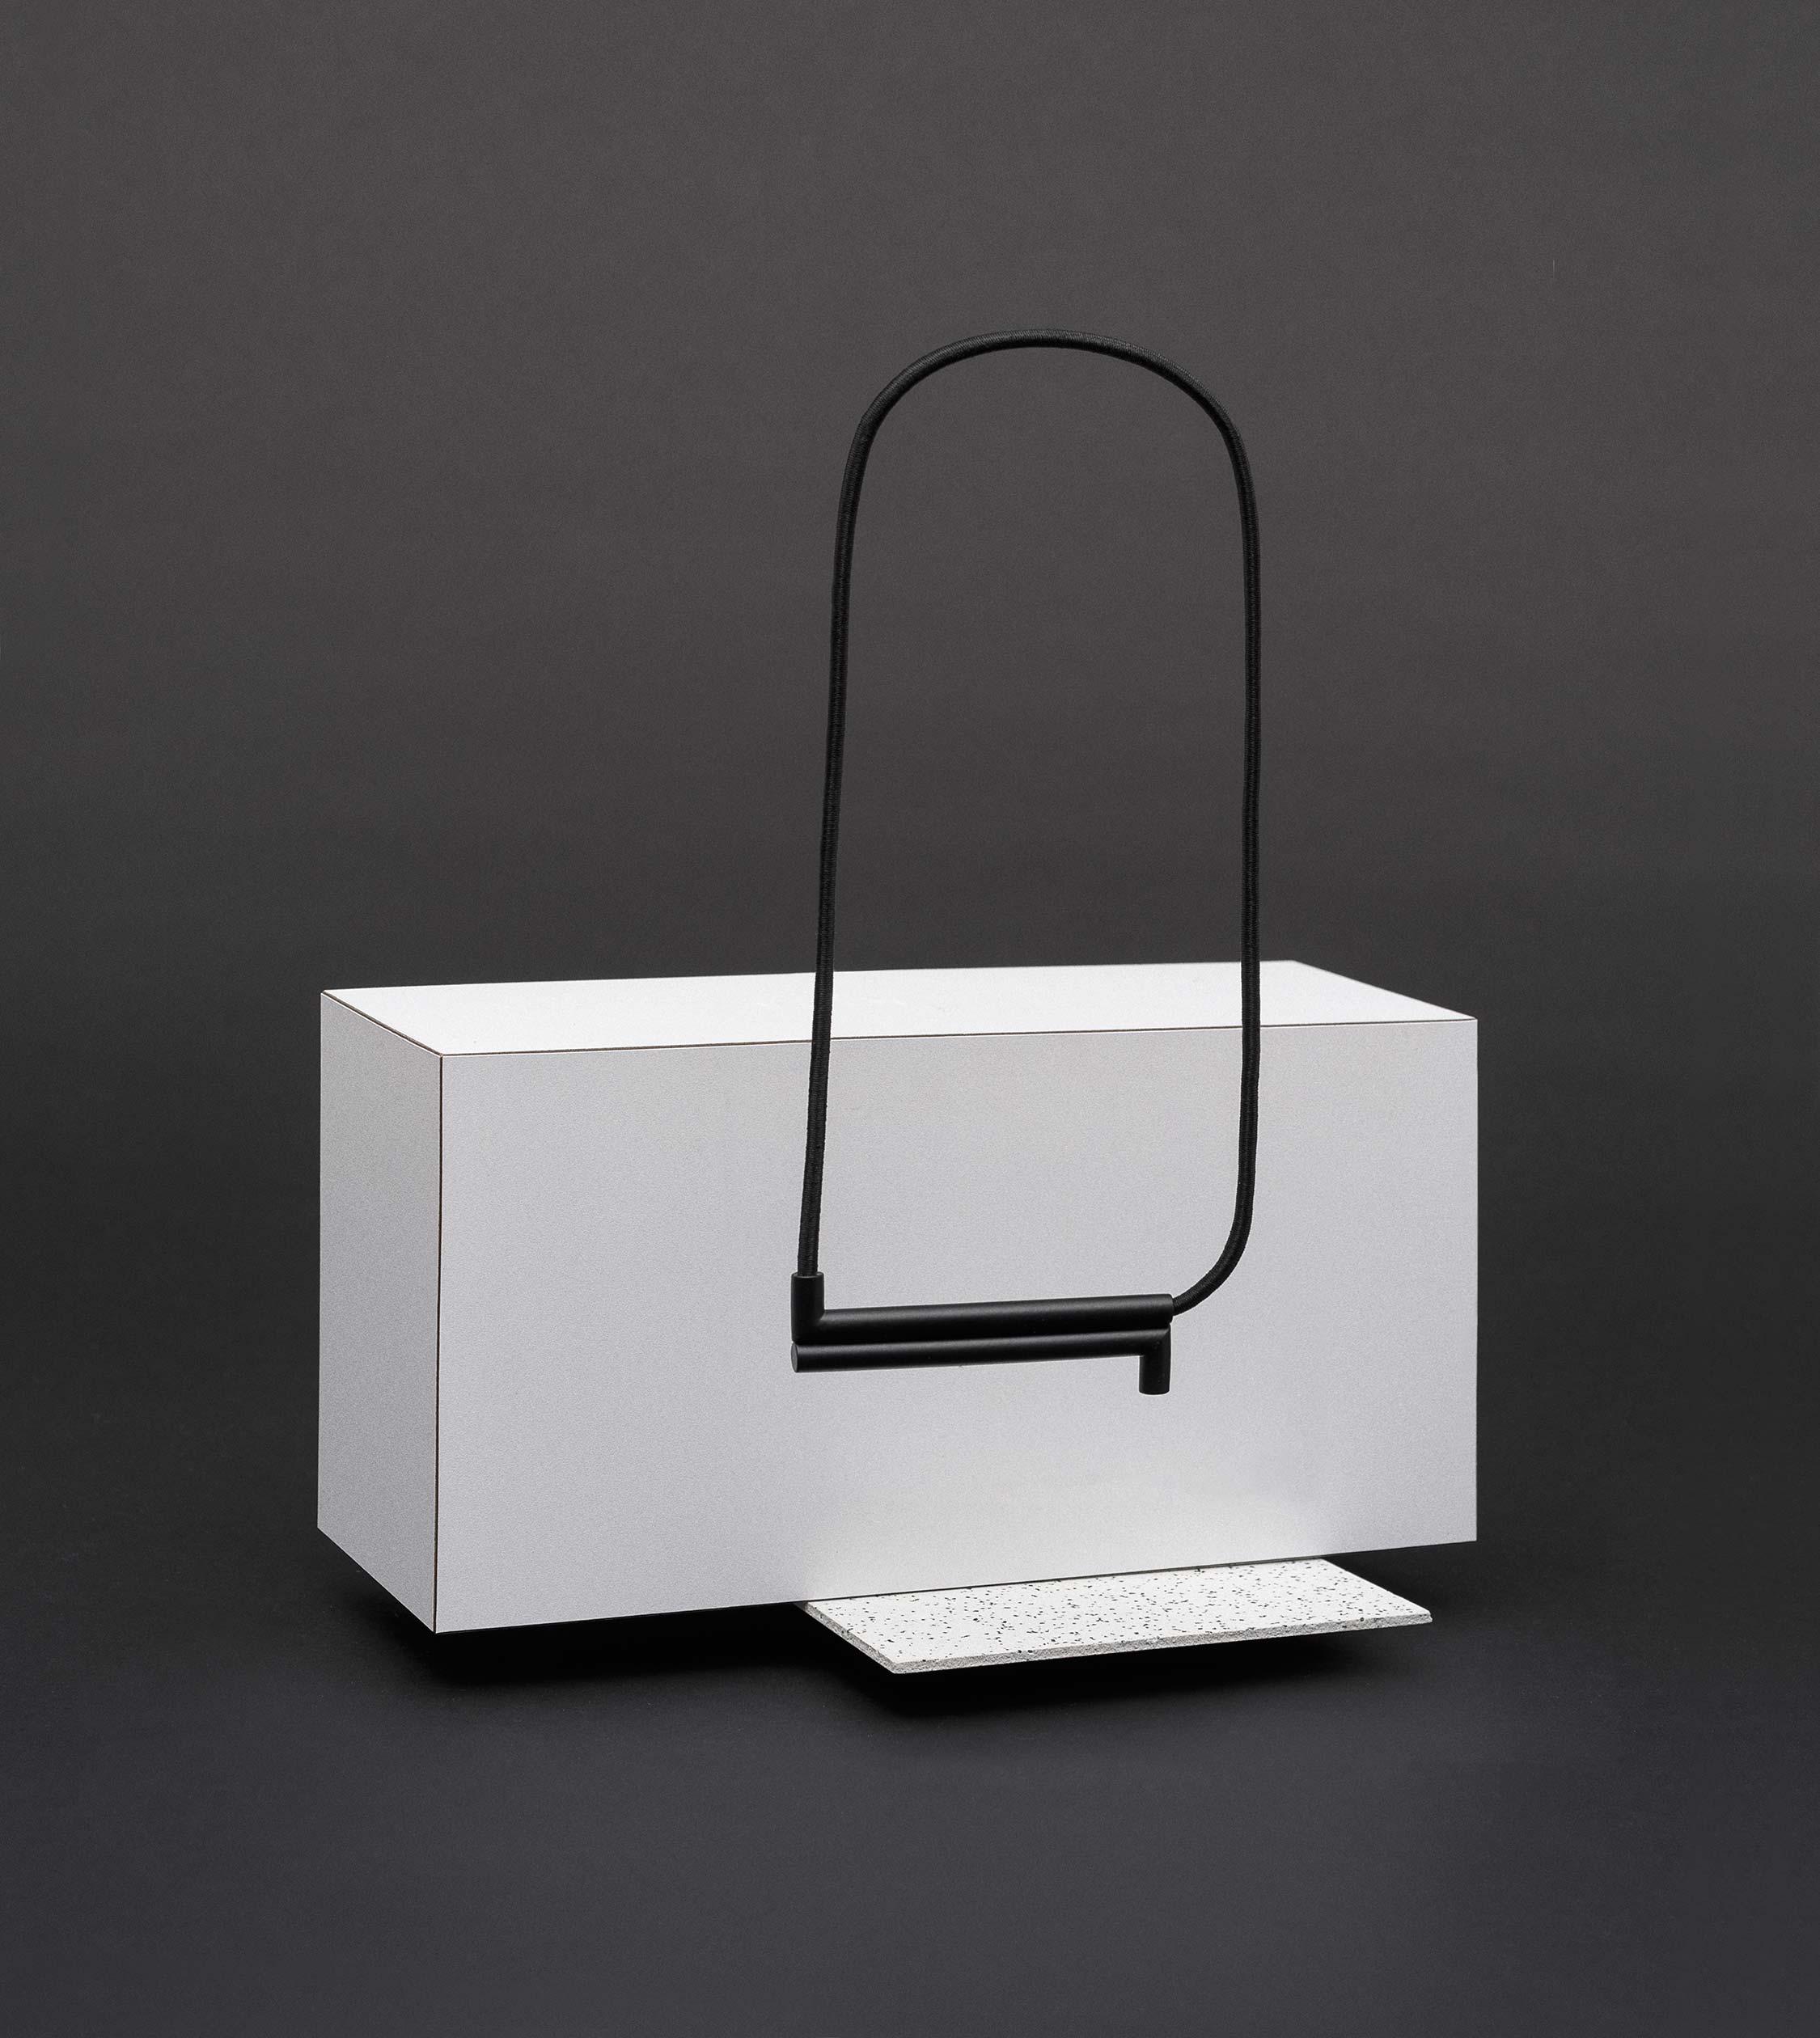 ONA_Collection_Agathe_Palavioux_Maud_Beauchamp_model_no_20